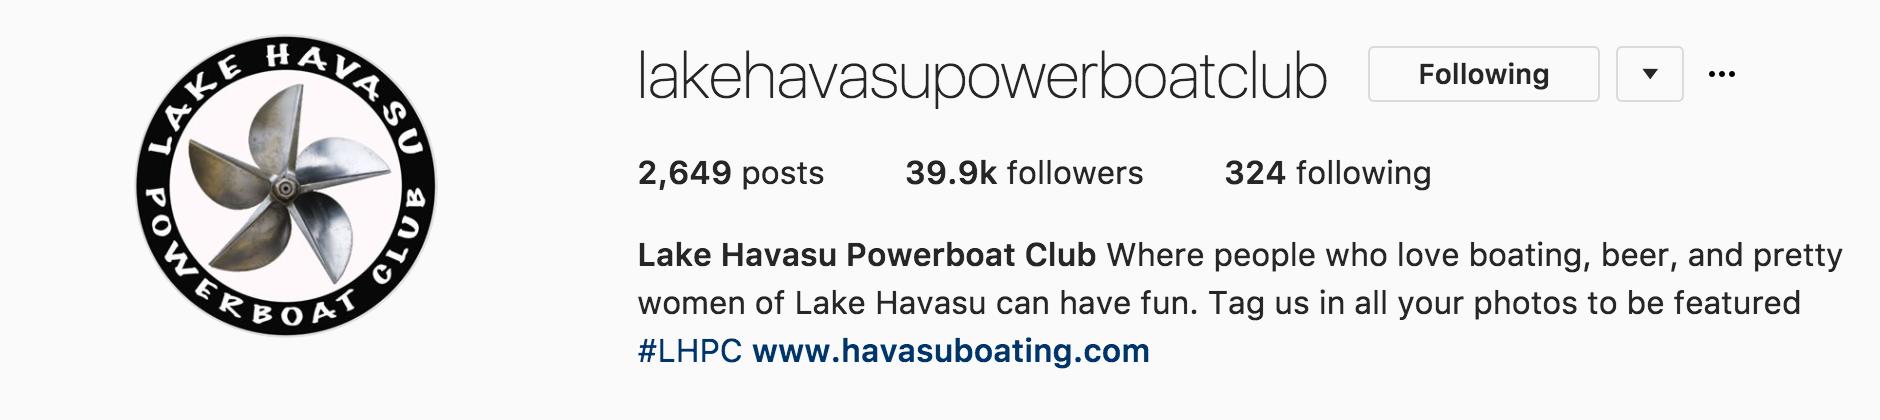 Lake Havasu Powerboat Club